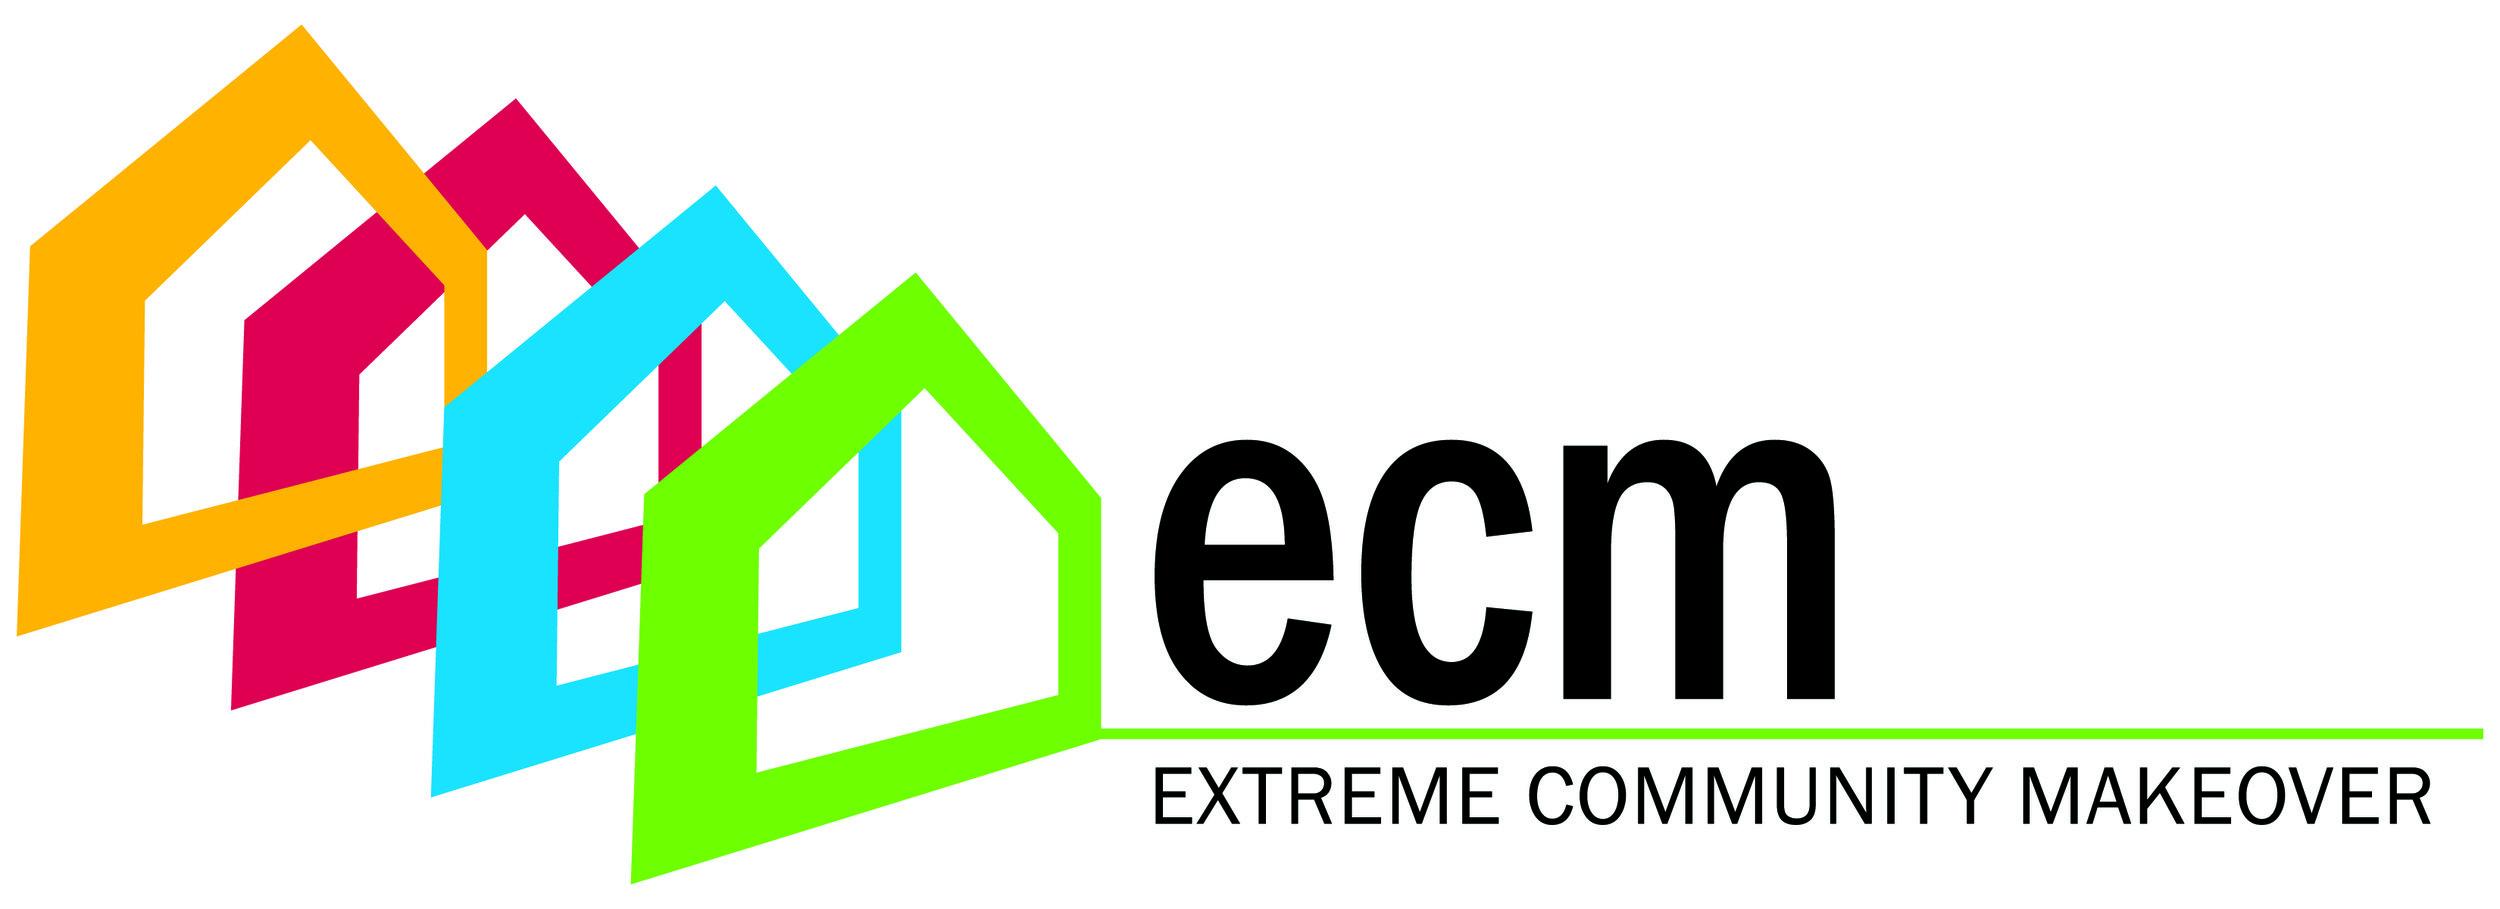 ECM Logo 002.jpg